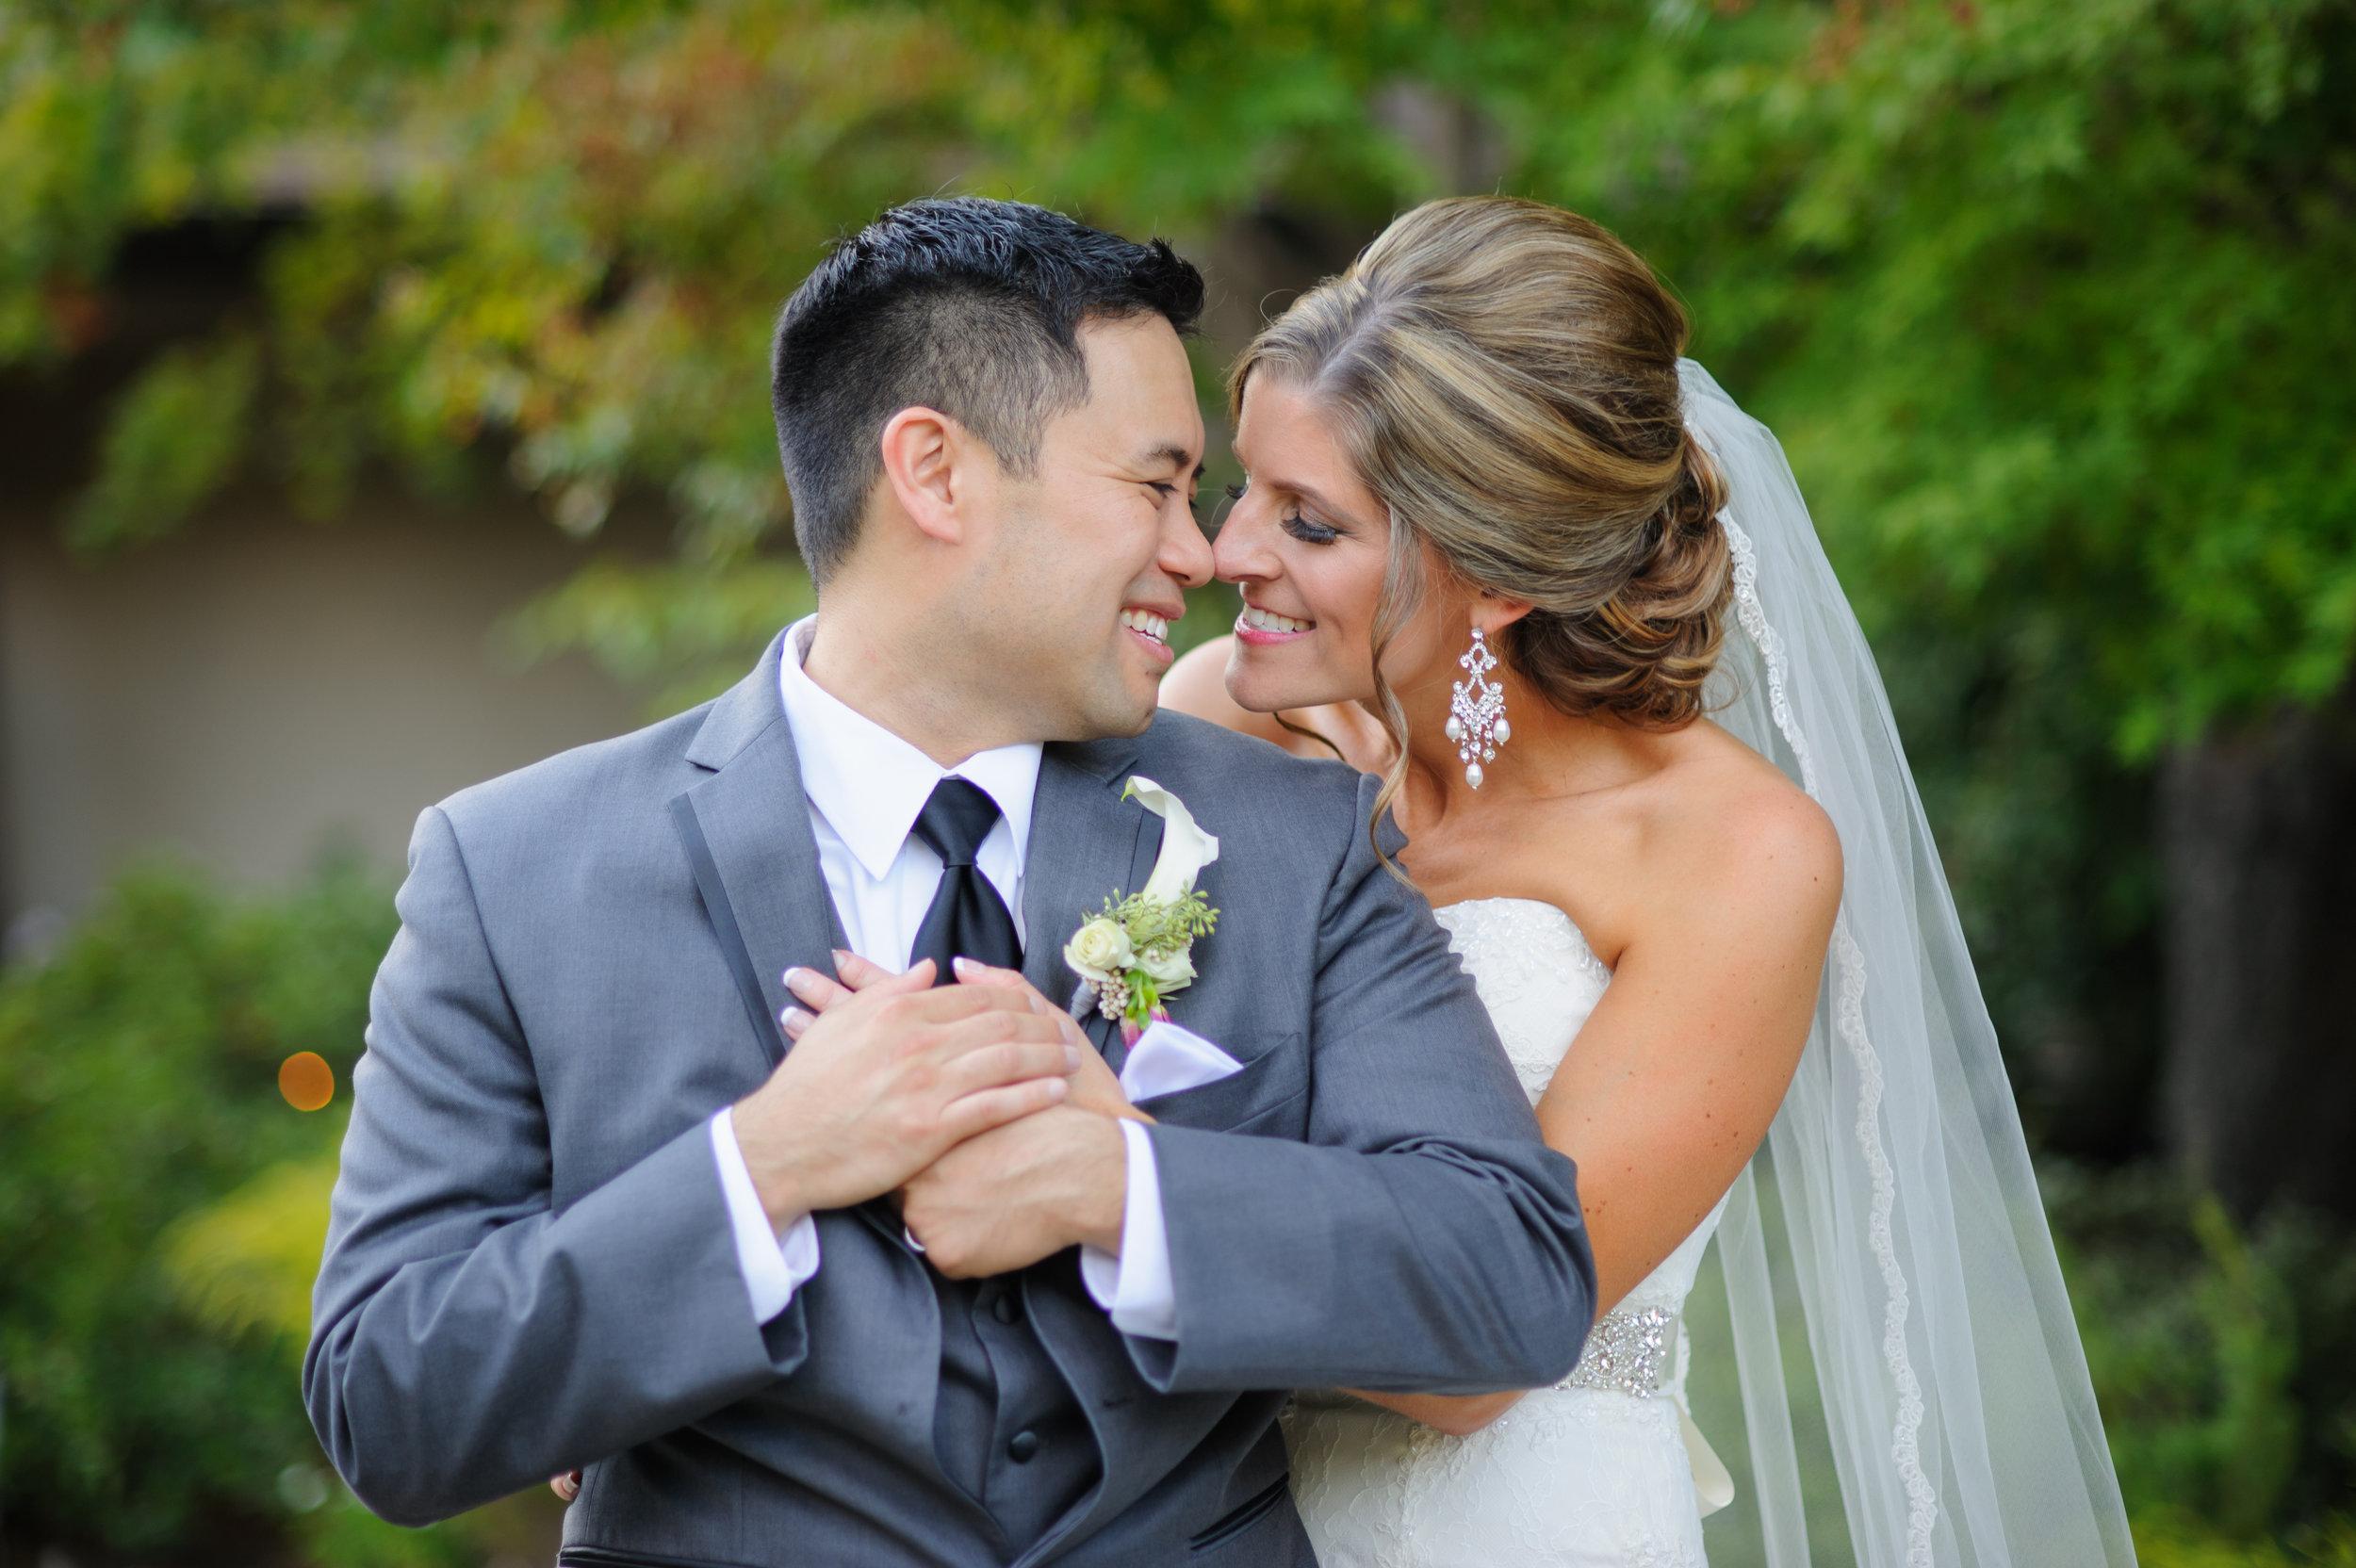 susan-brad-025-sacramento-wedding-photographer-katherine-nicole-photography.JPG